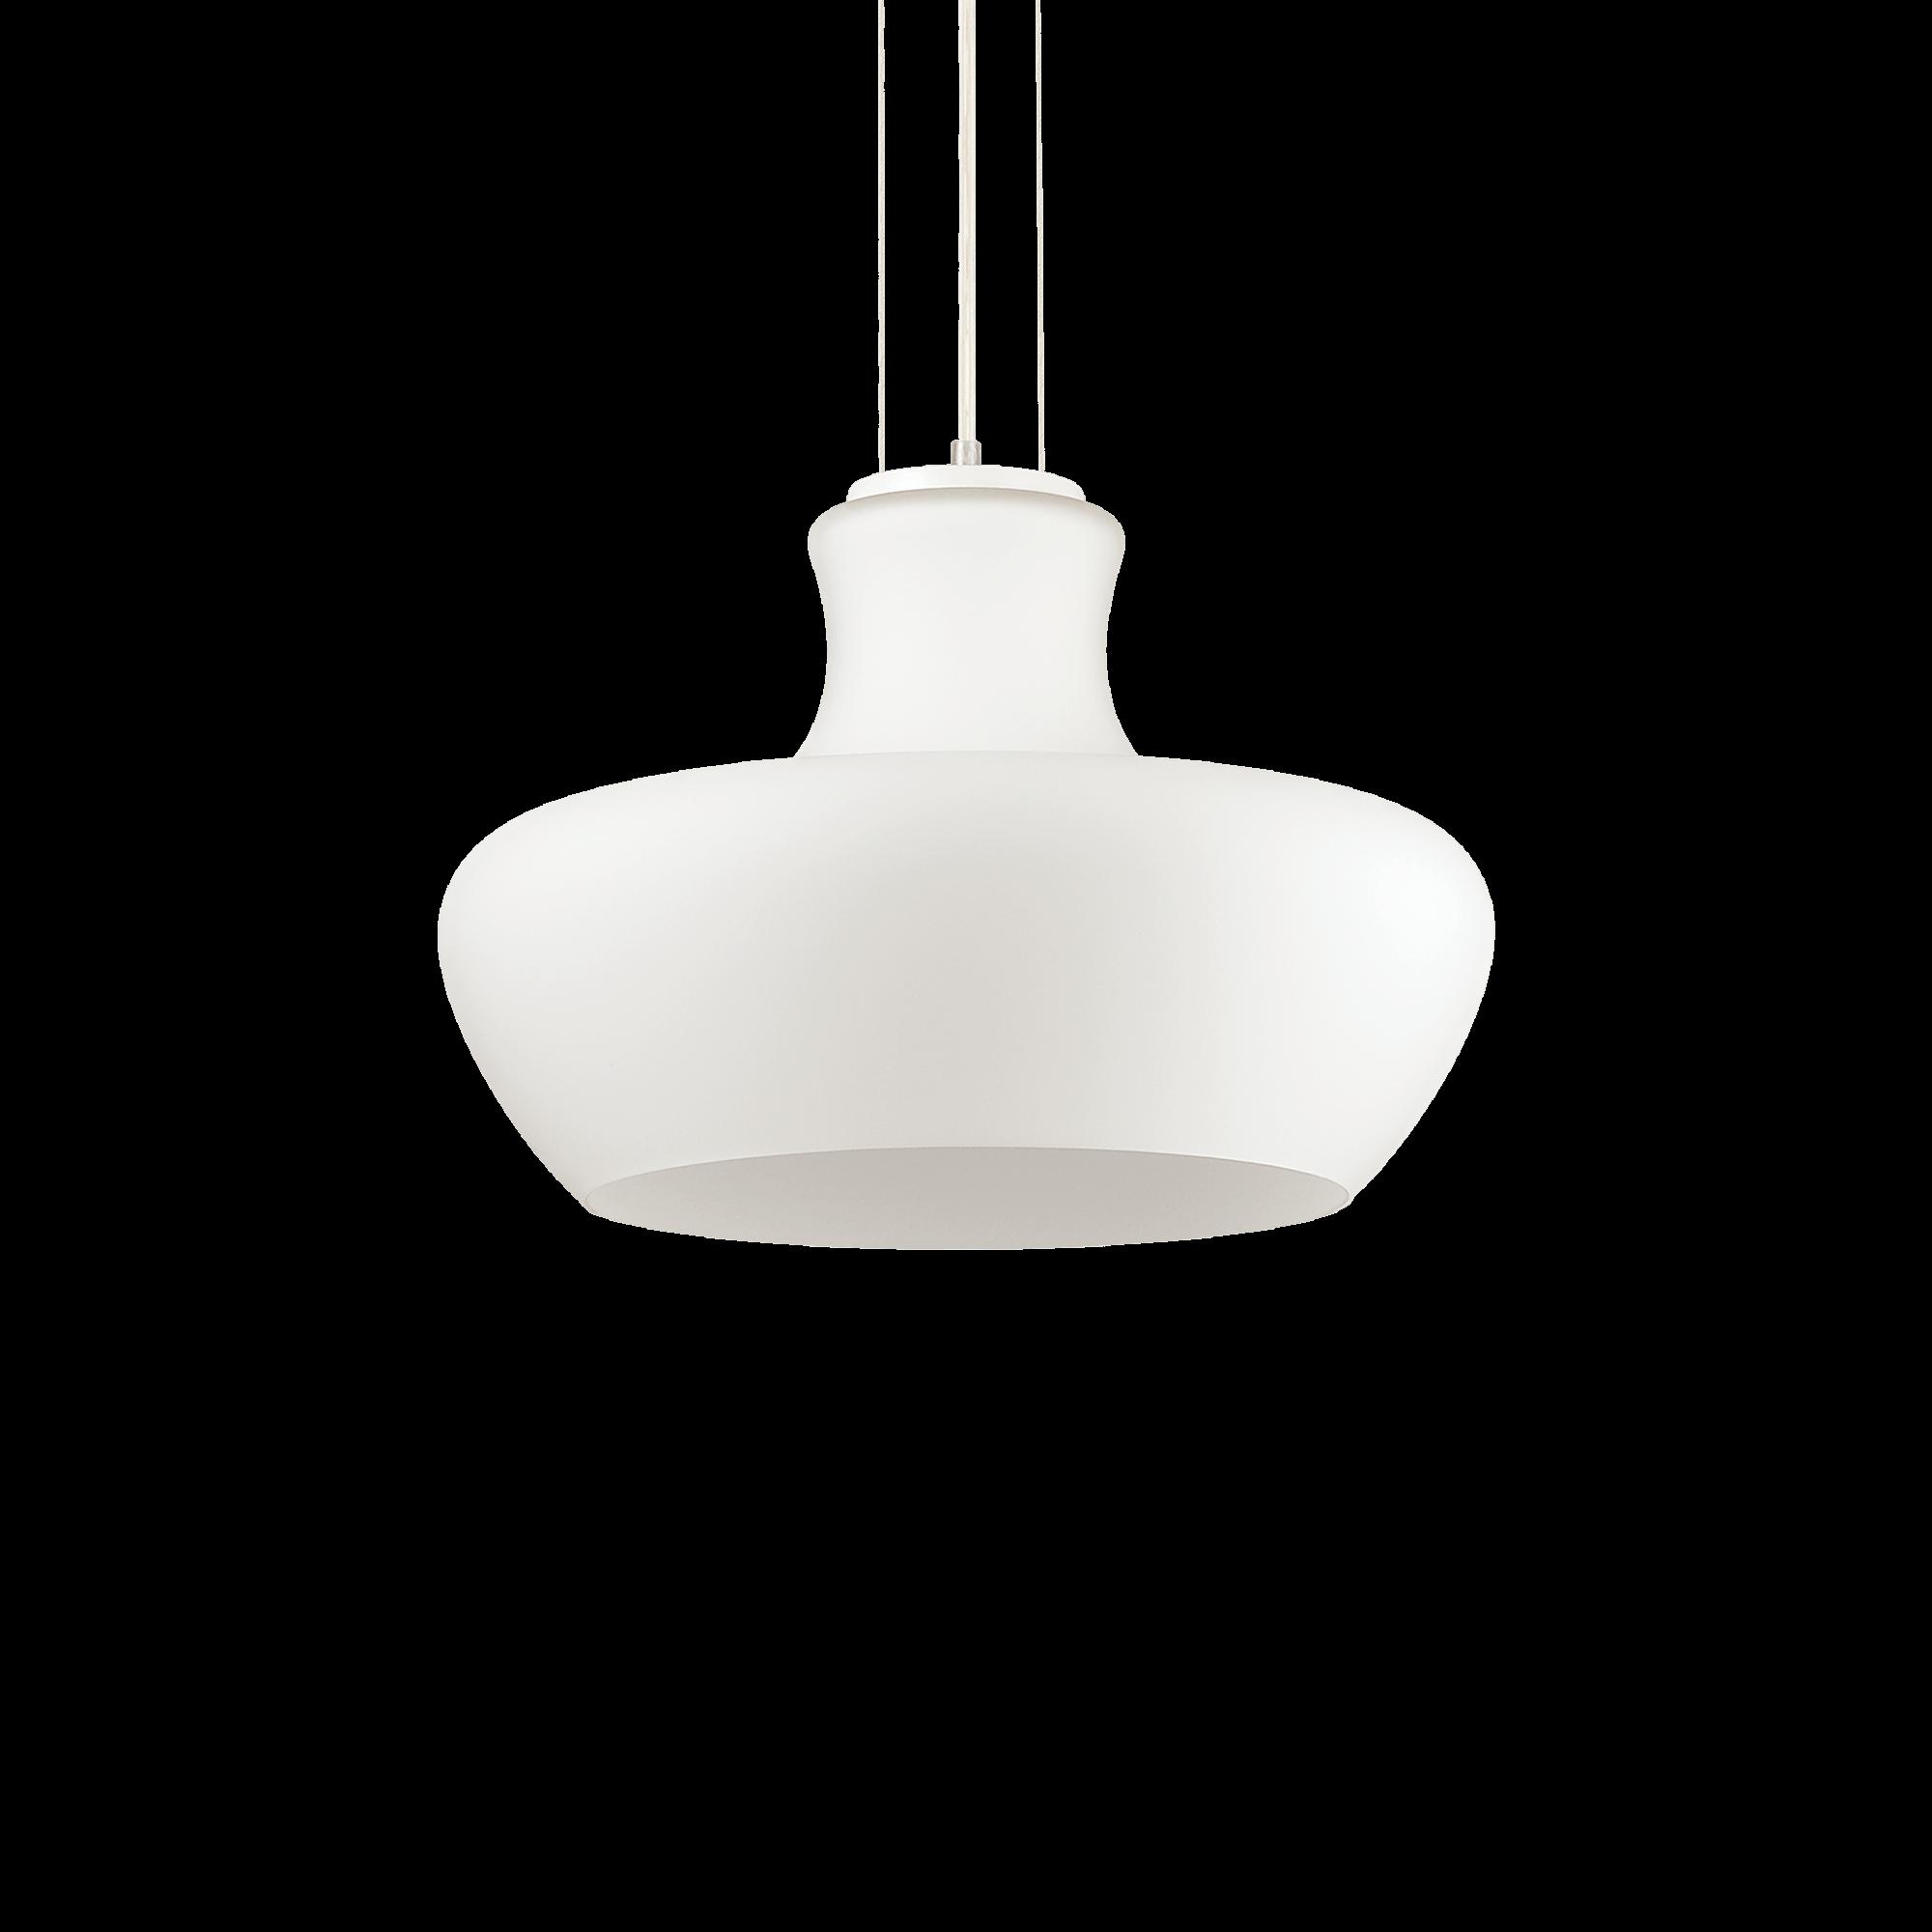 Ideal Lux 137308 Aladino SP1 D45 Bianco 1 izzós függeszték